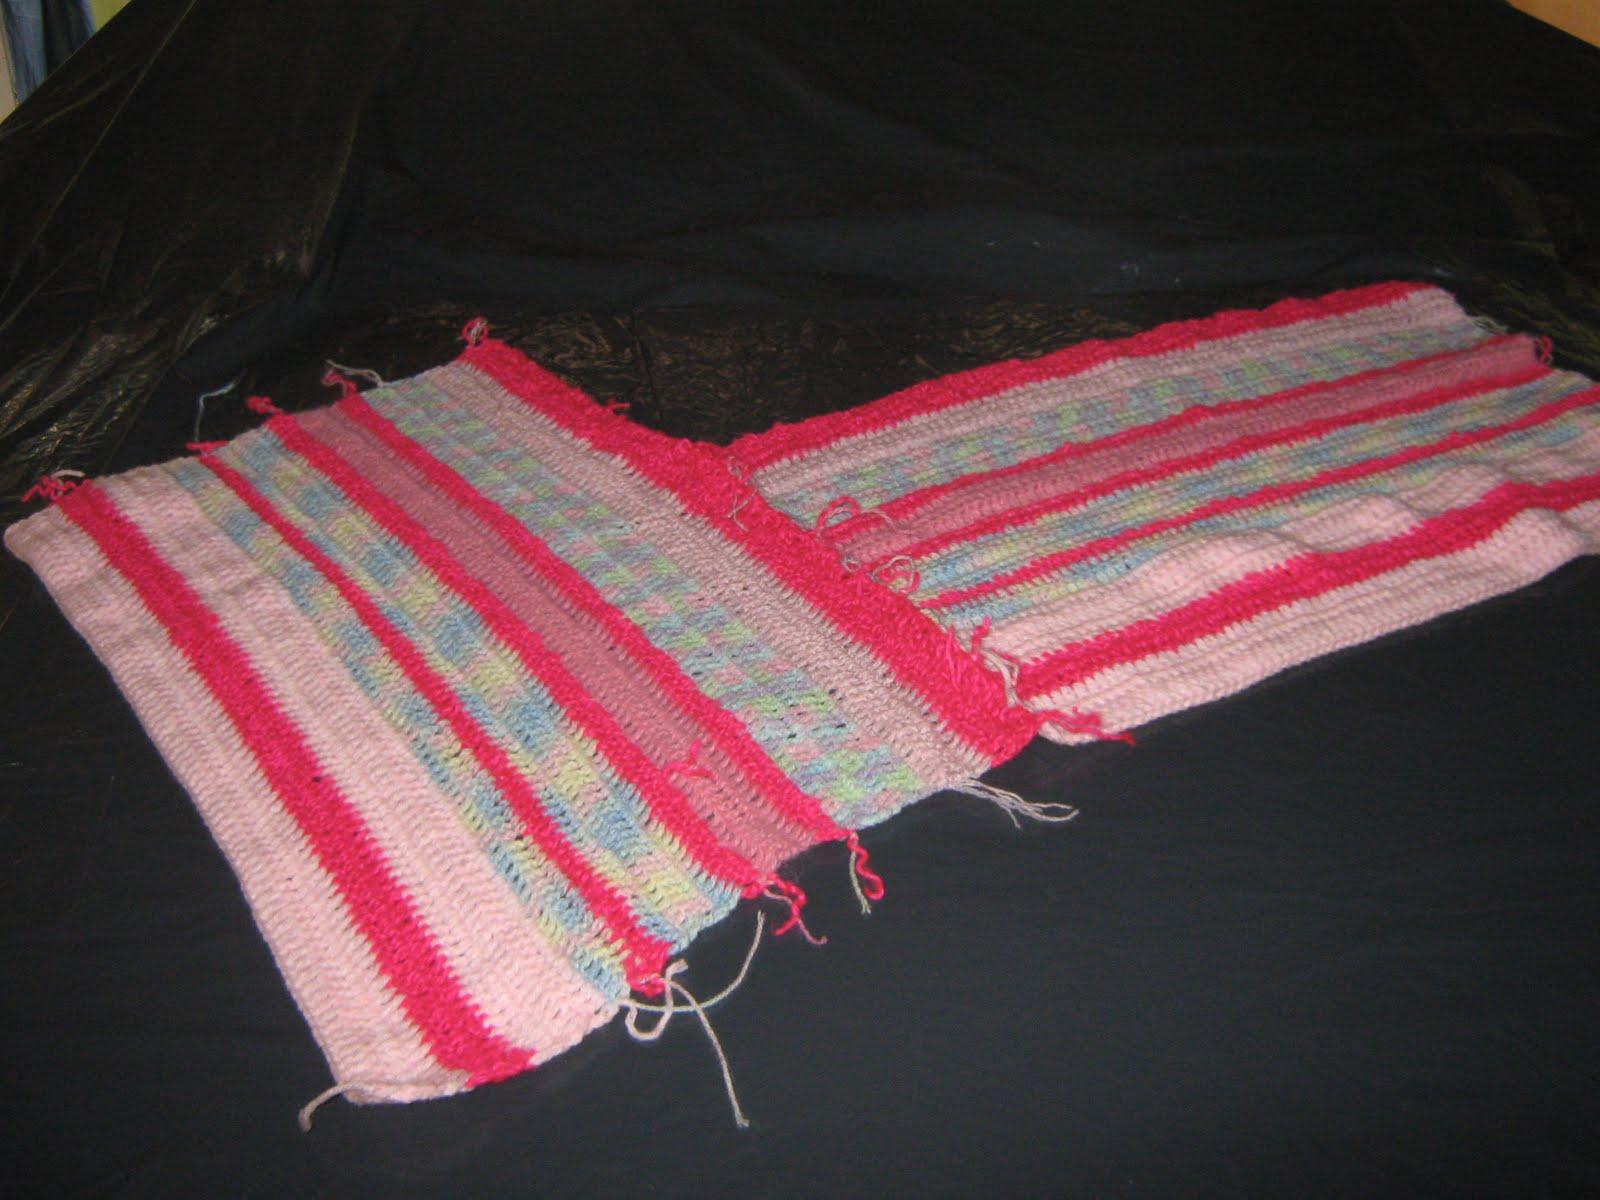 poncho con rectangulos poncho con rectangulos tejiendo estoy poncho. Black Bedroom Furniture Sets. Home Design Ideas